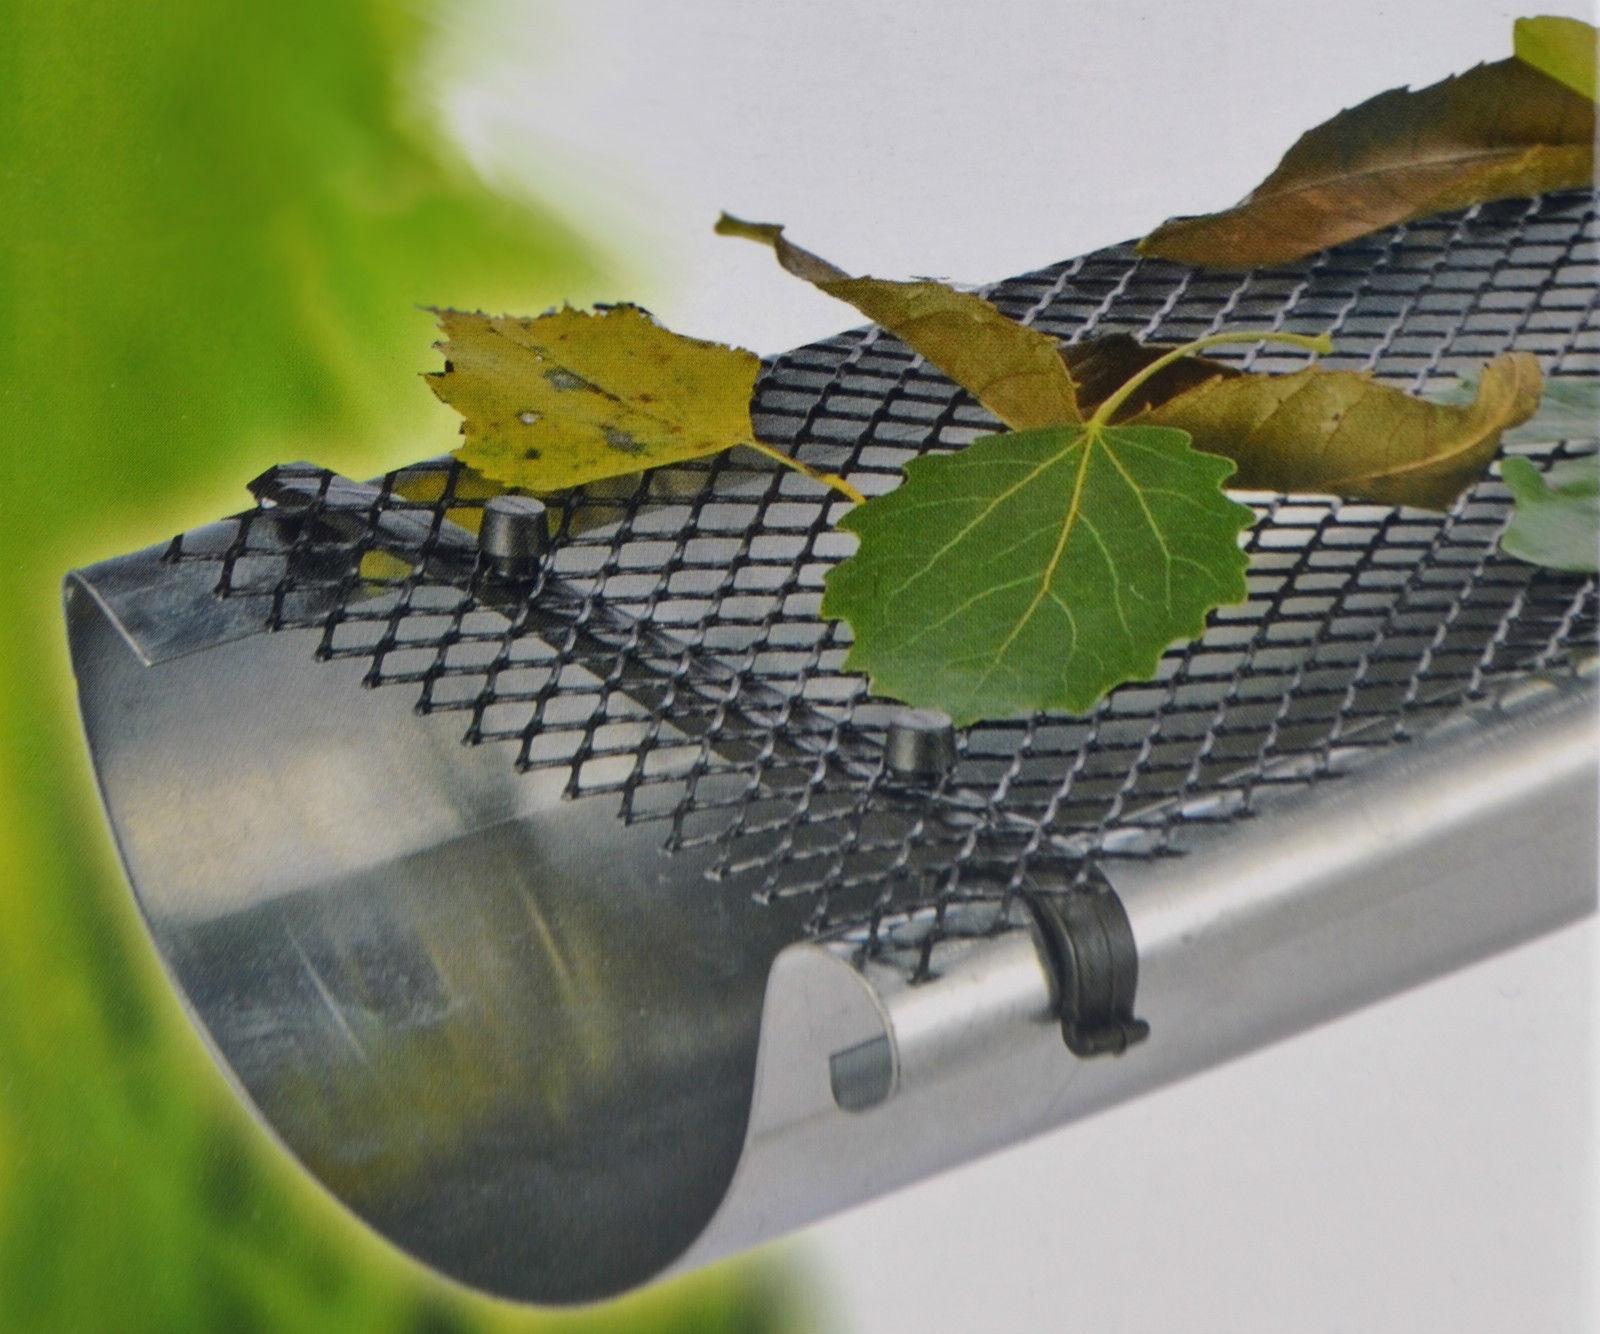 24m Dachrinnenschutz Laubschutz Gitter Dachrinne Laubfang Regenrinne Marderschutz